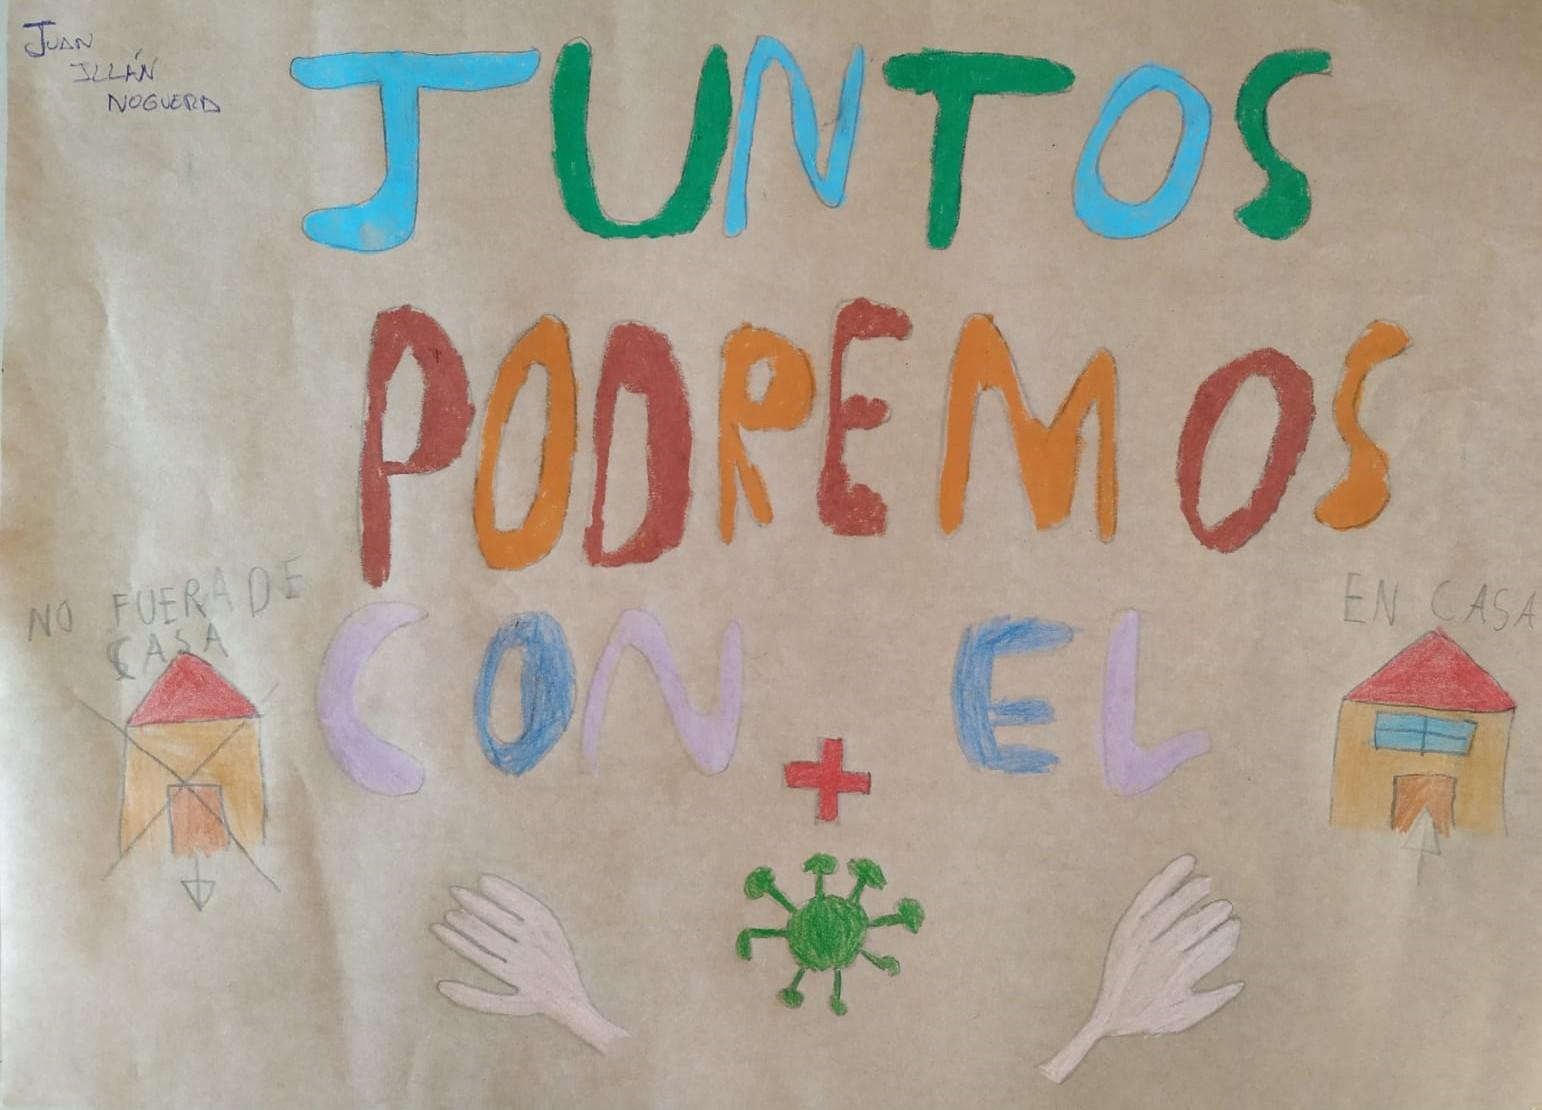 Images/actividades/Juan 8 años.jpg